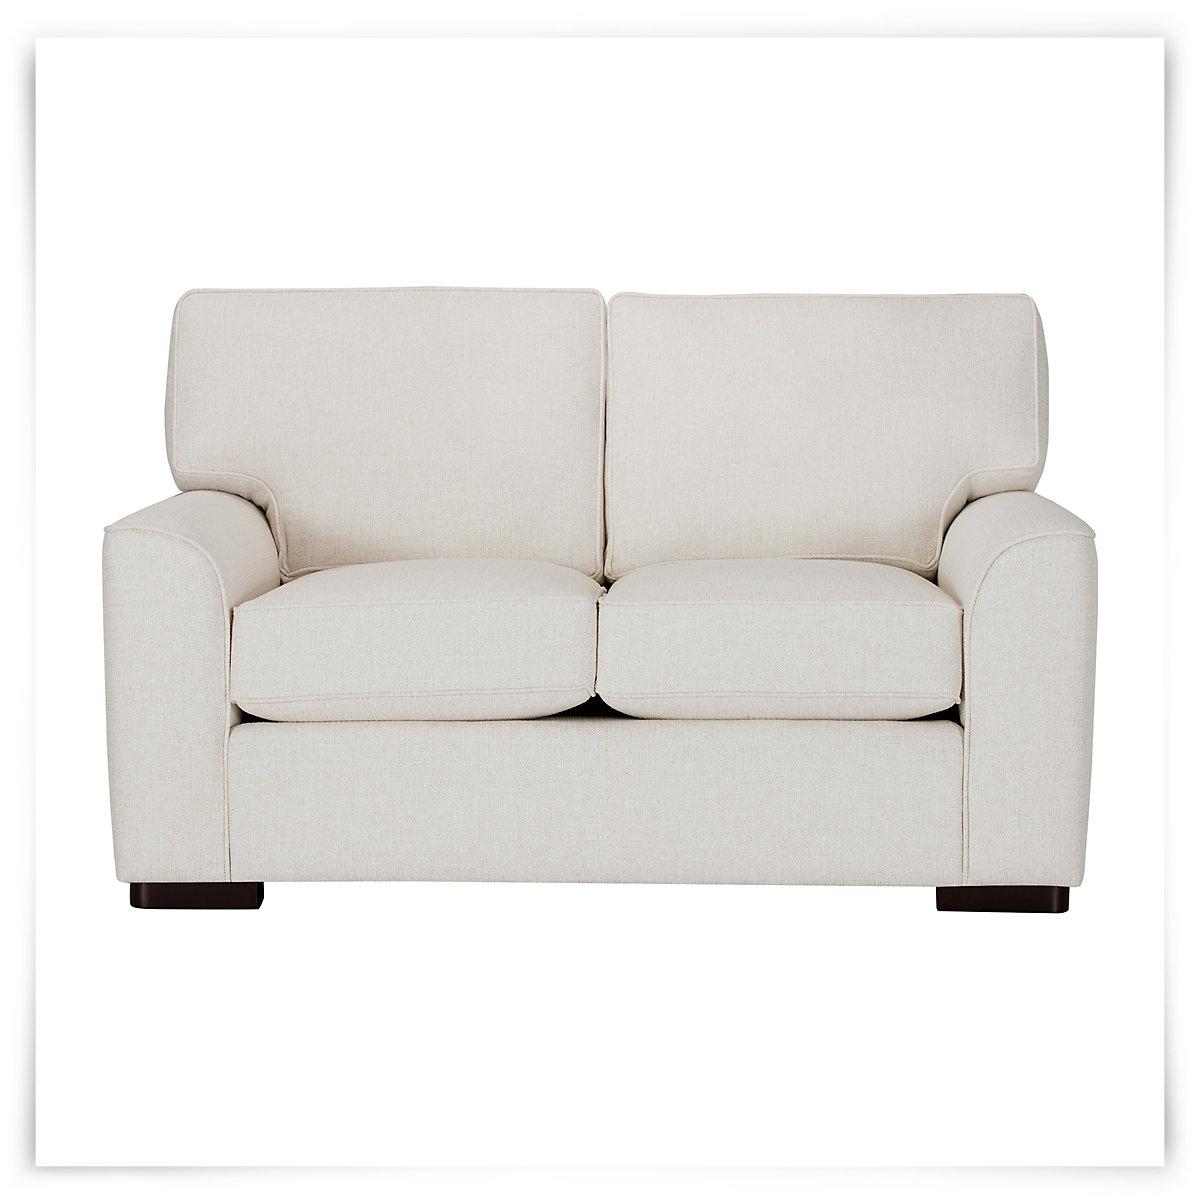 City Furniture Austin White Fabric Loveseat